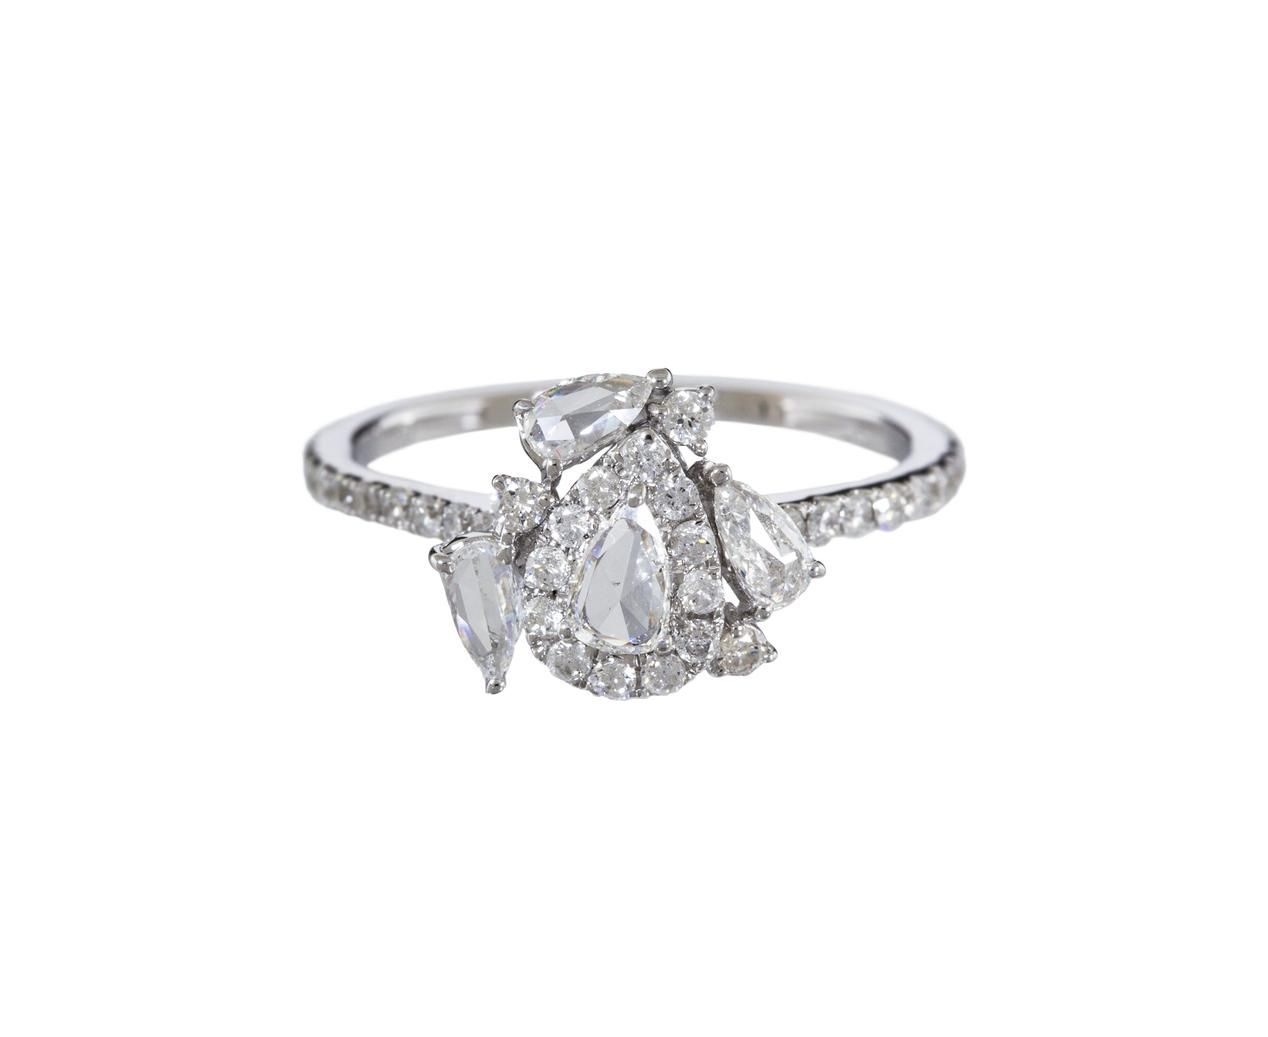 Pear shaped diamond mosaic solitaire pear diamond rings